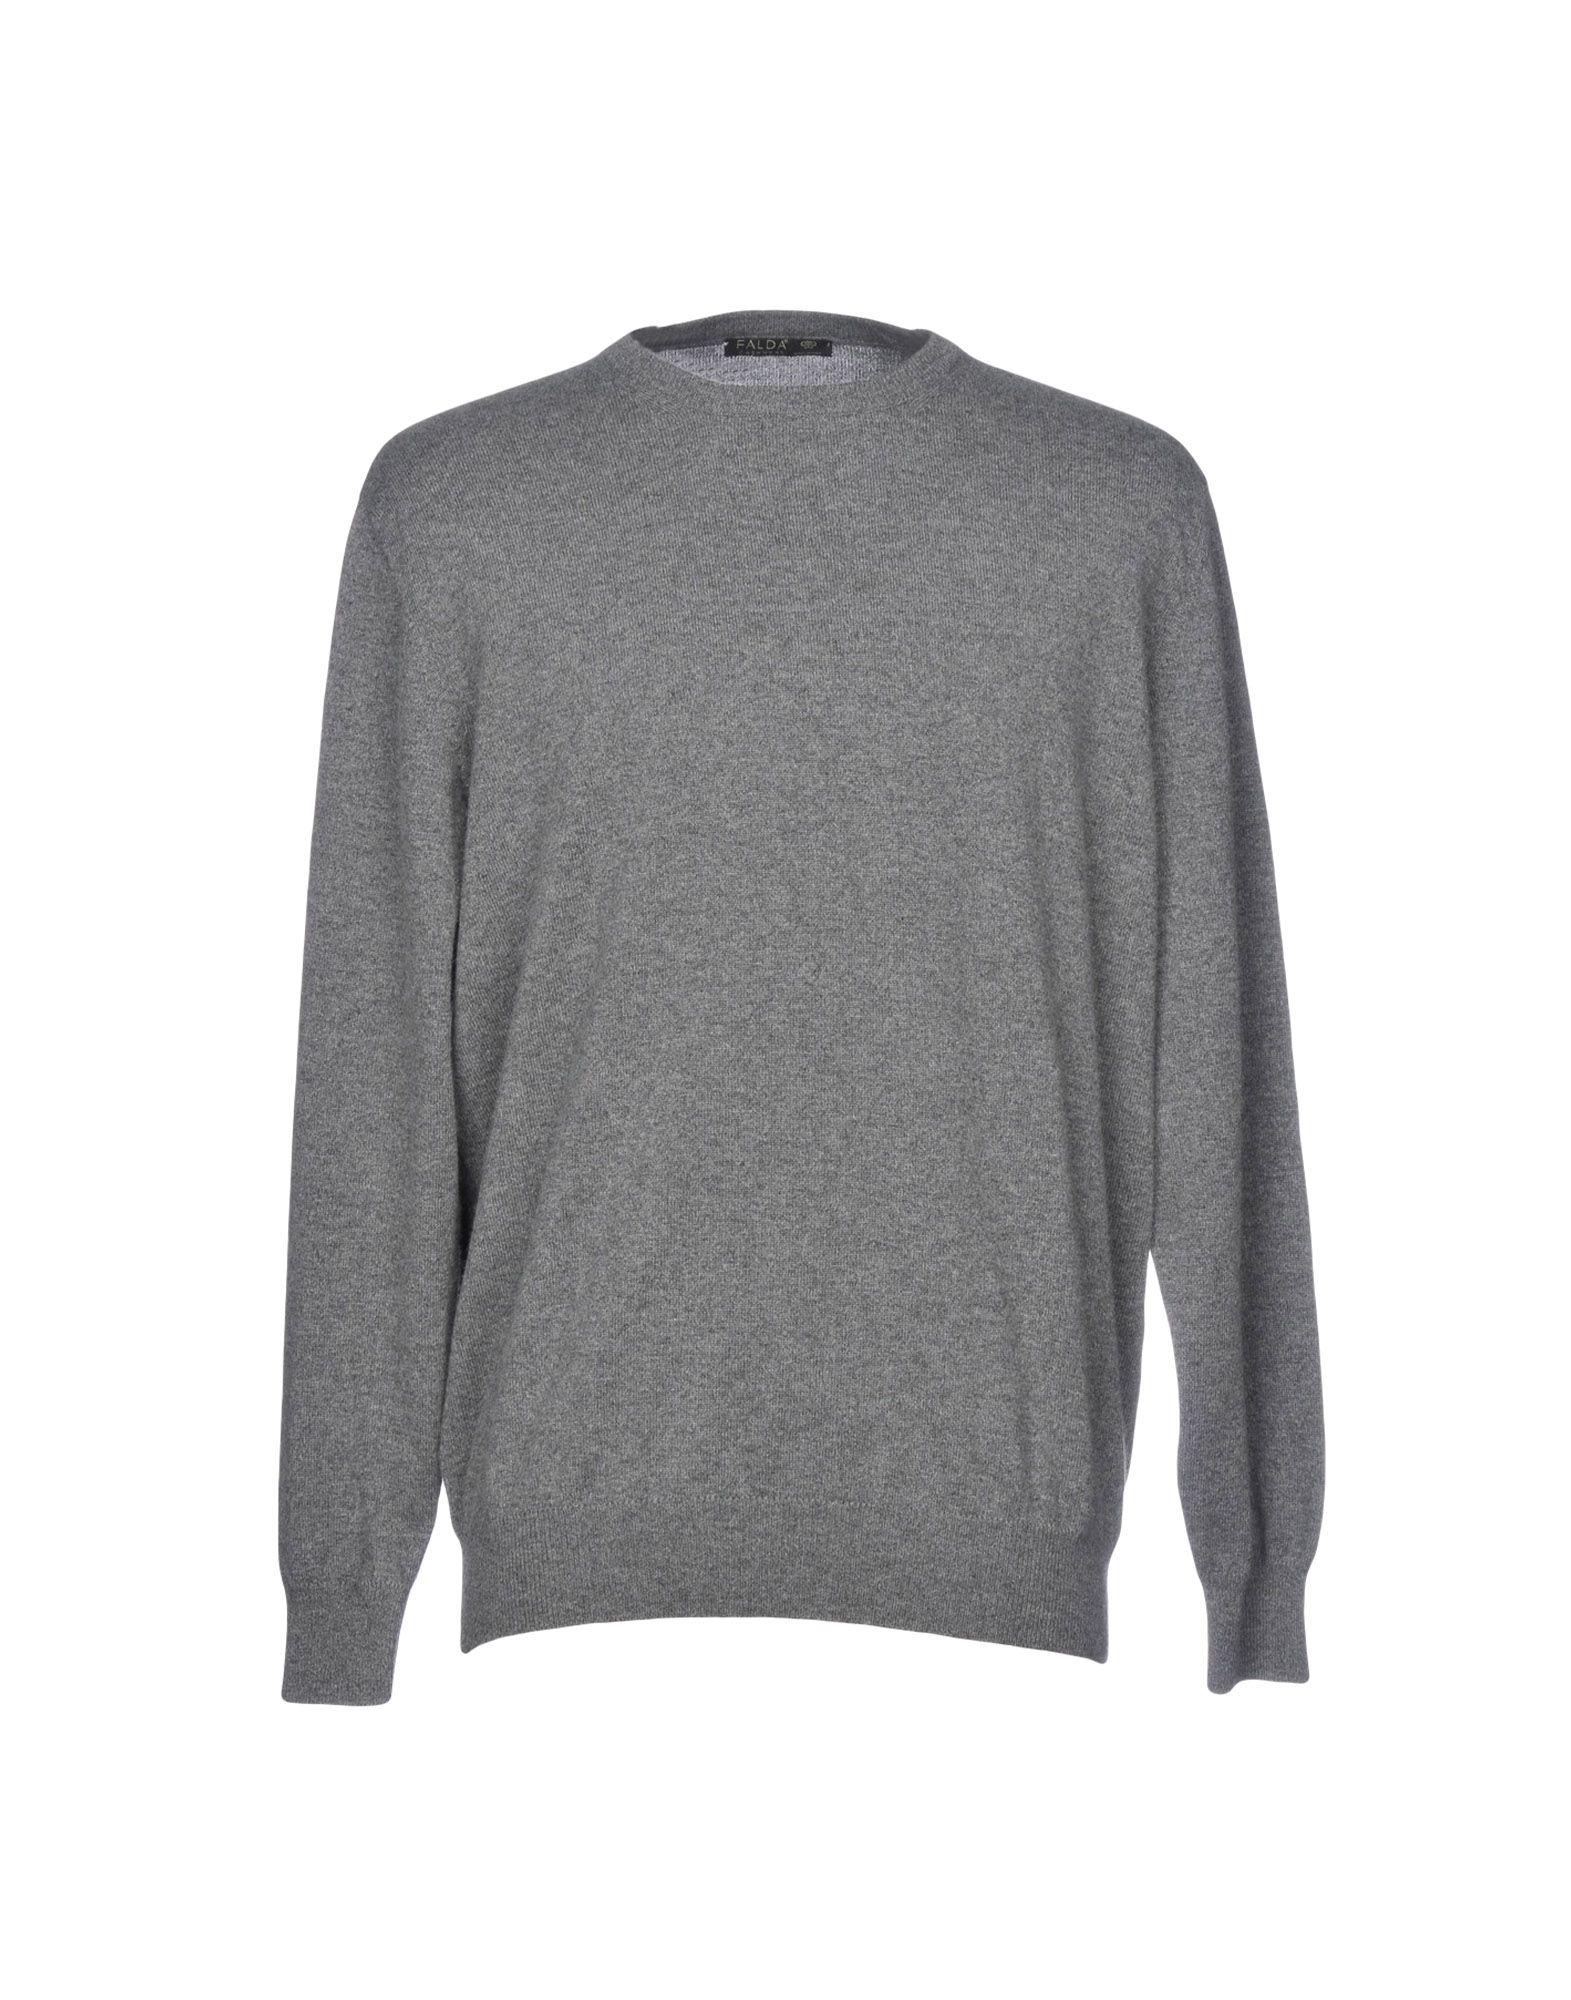 FALDA CASHMERE Свитер autumn cashmere свитер